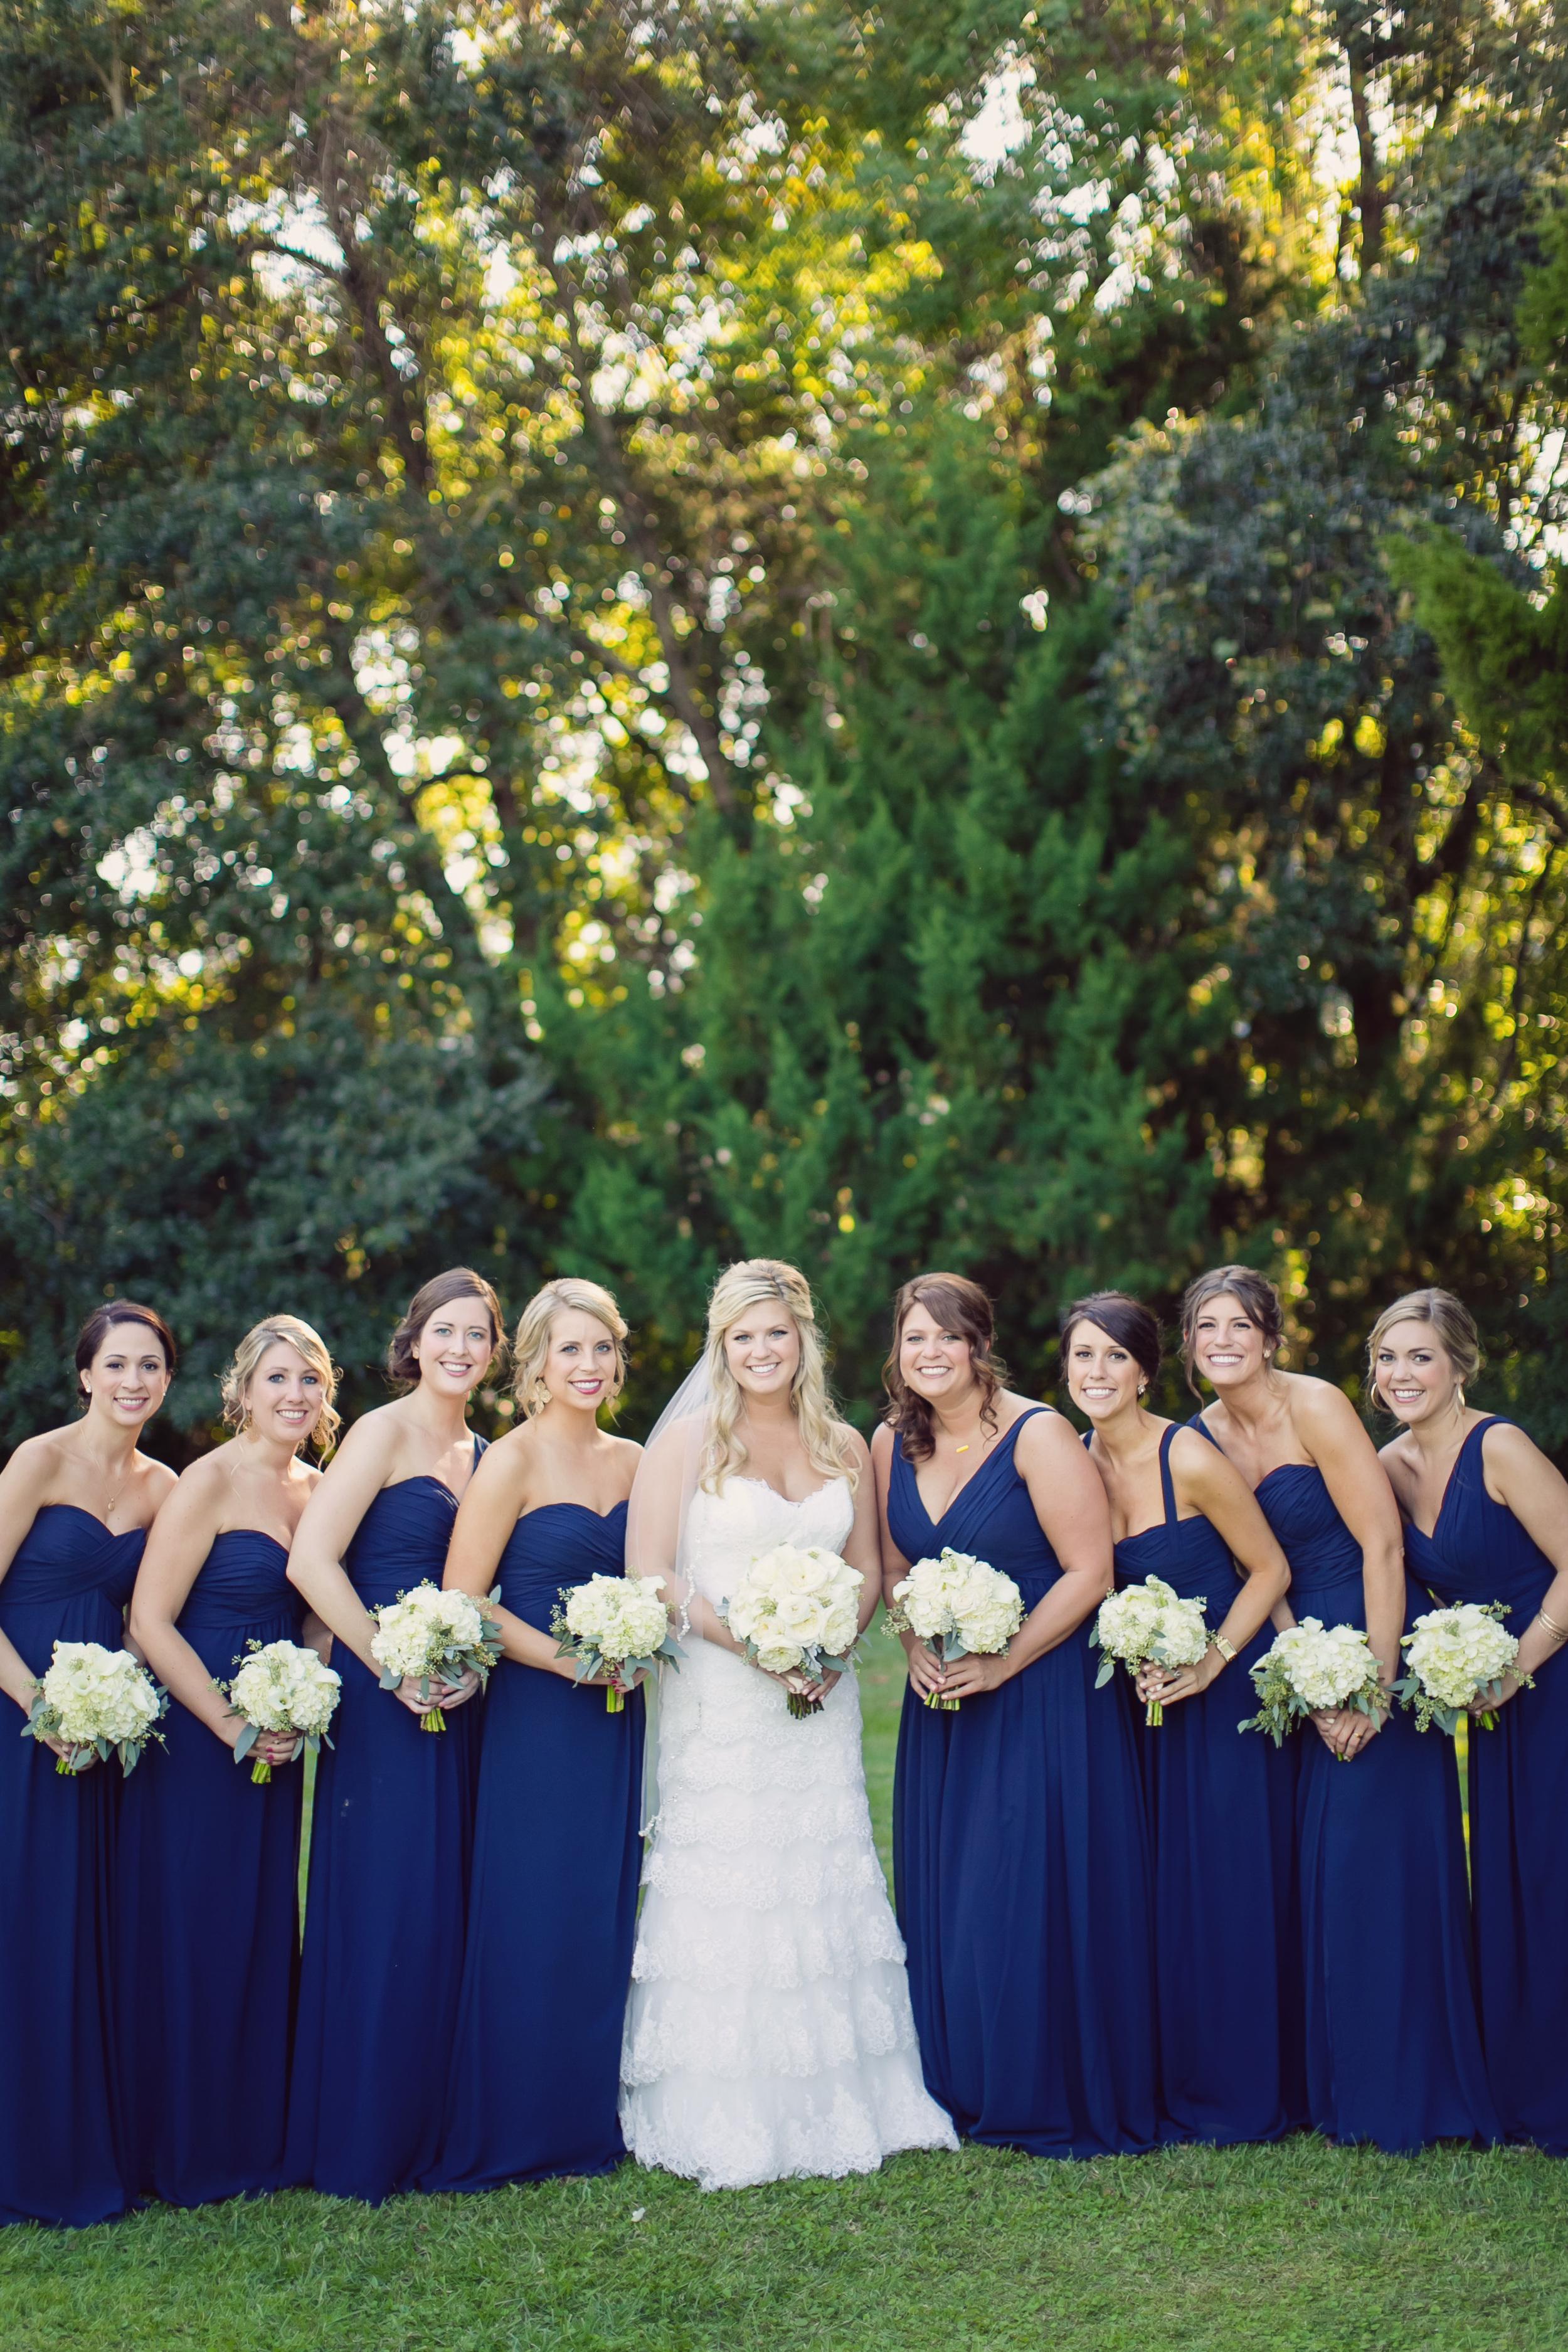 Navy blue bridesmaids dresses at Lowcountry wedding in Charleston, South Carolina